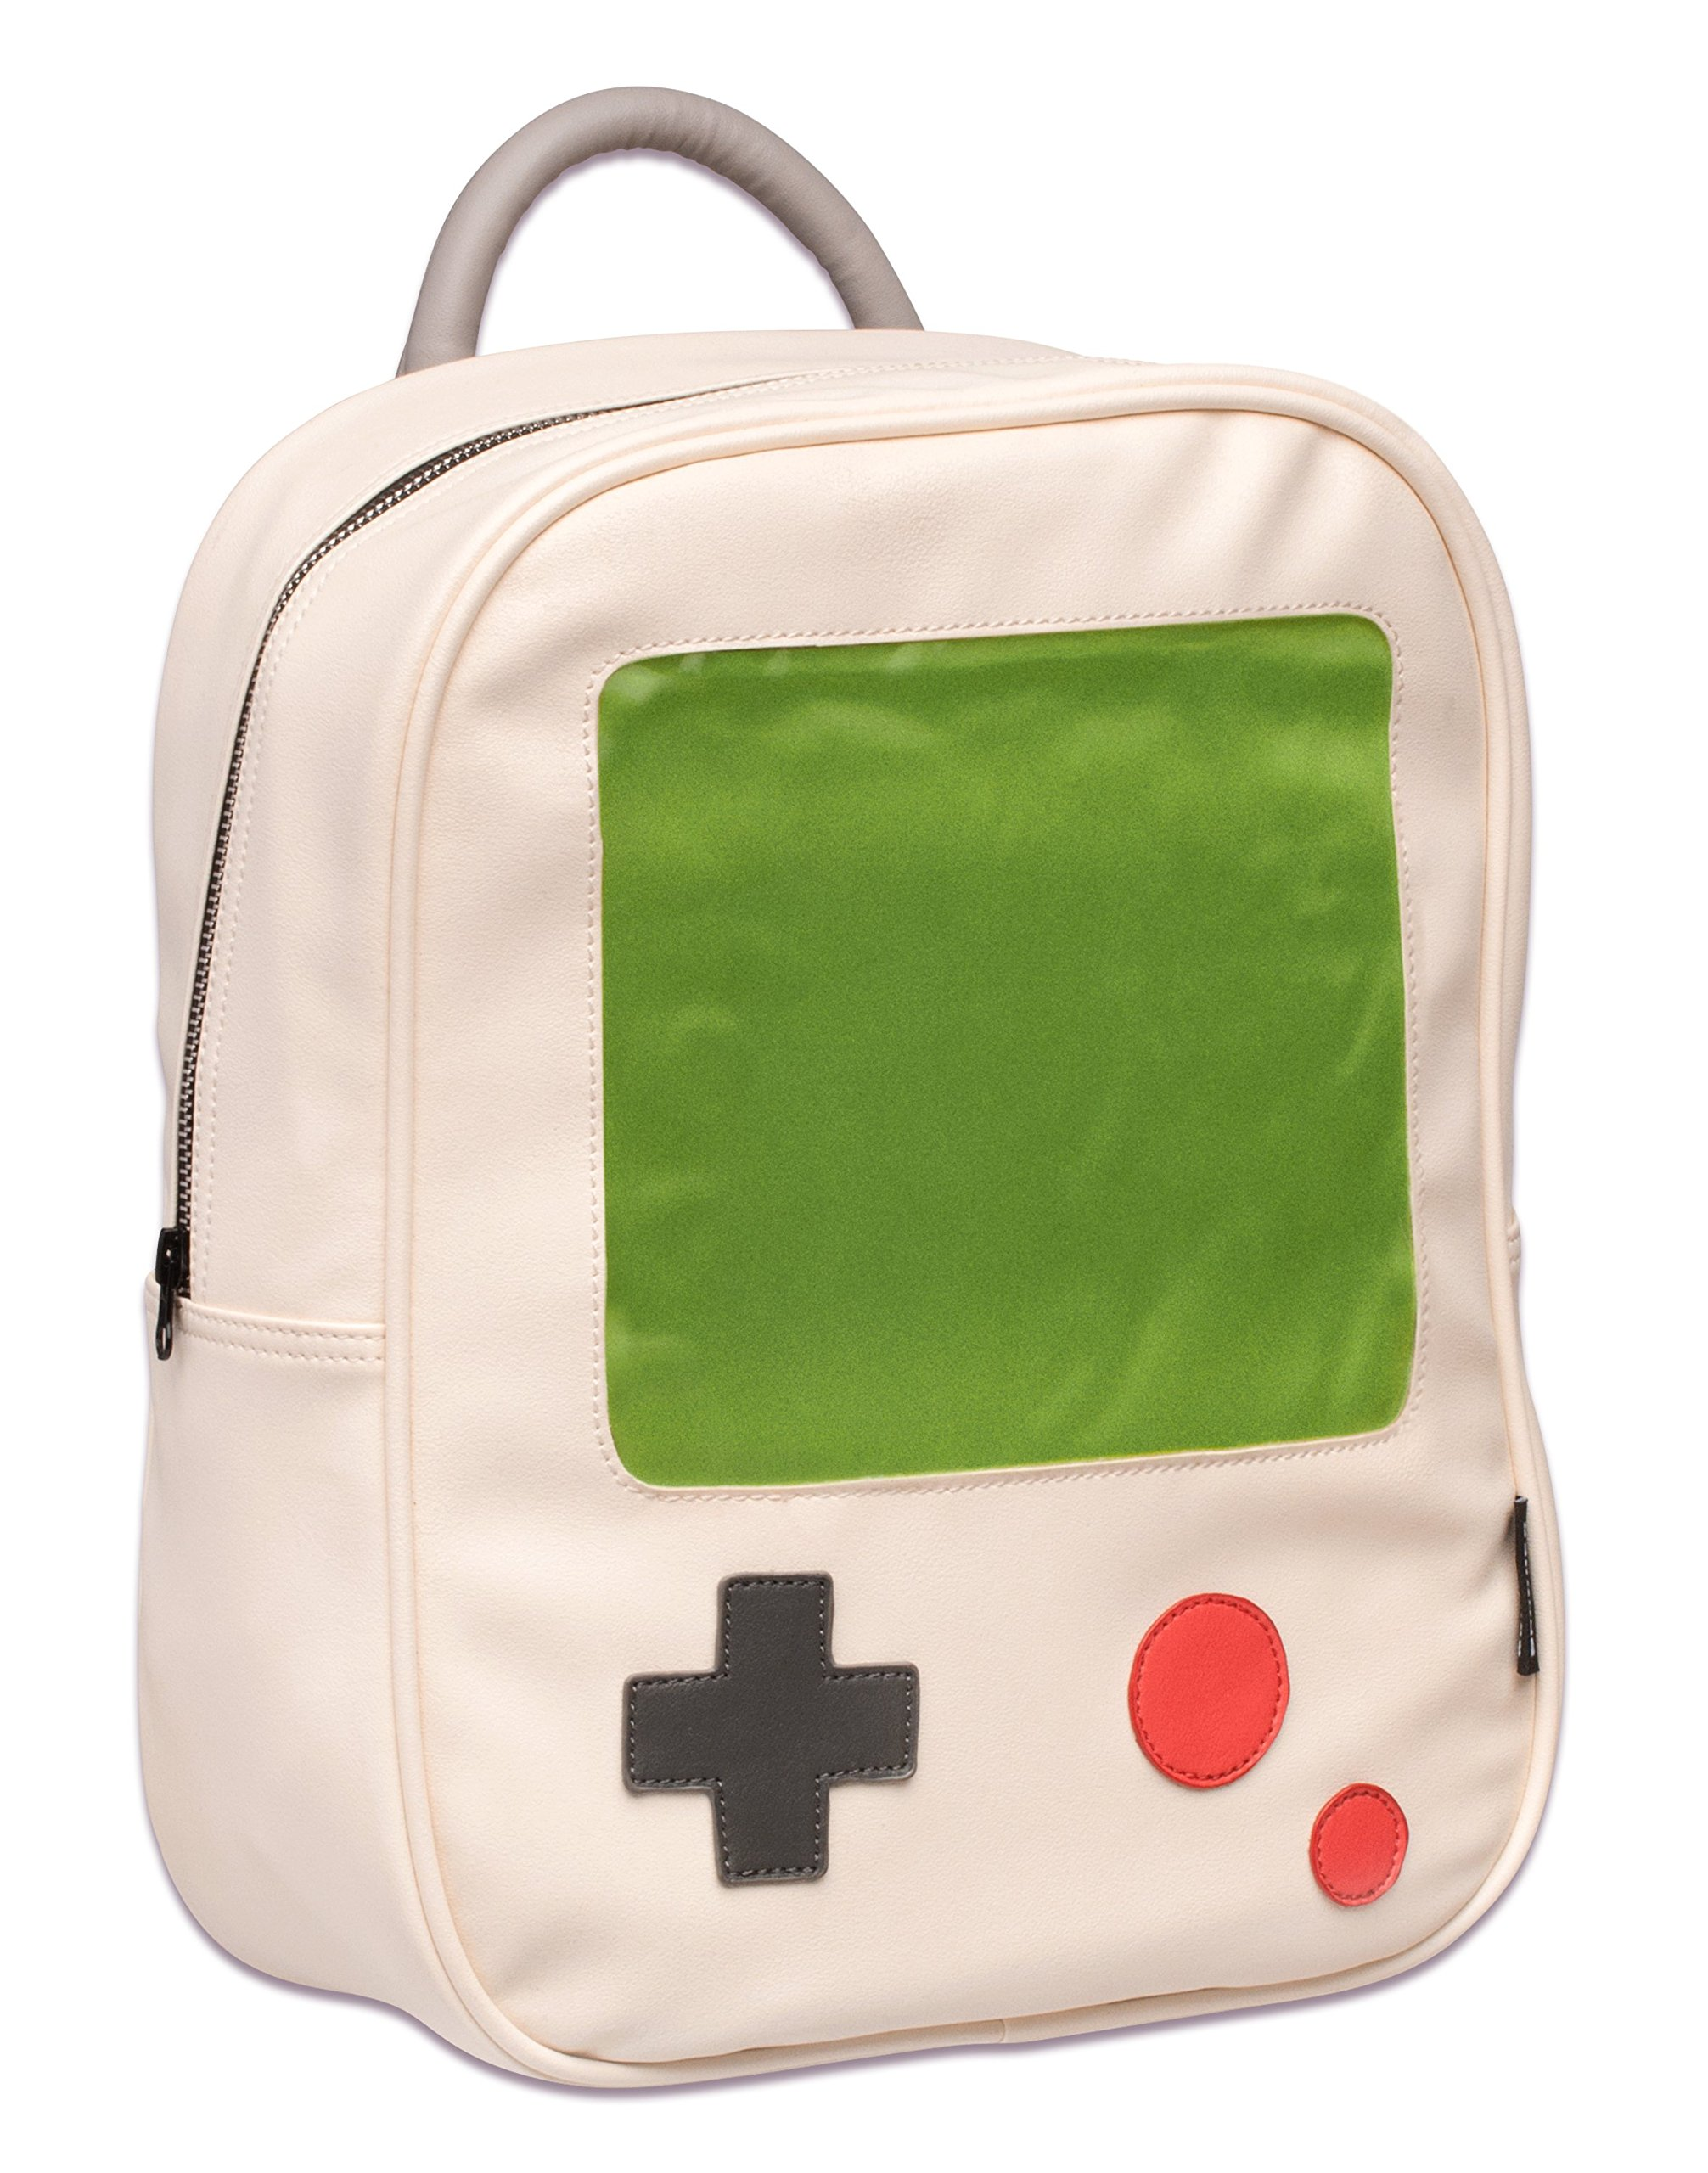 Sanshee Ita-Boy Classic Ita Bag Backpack